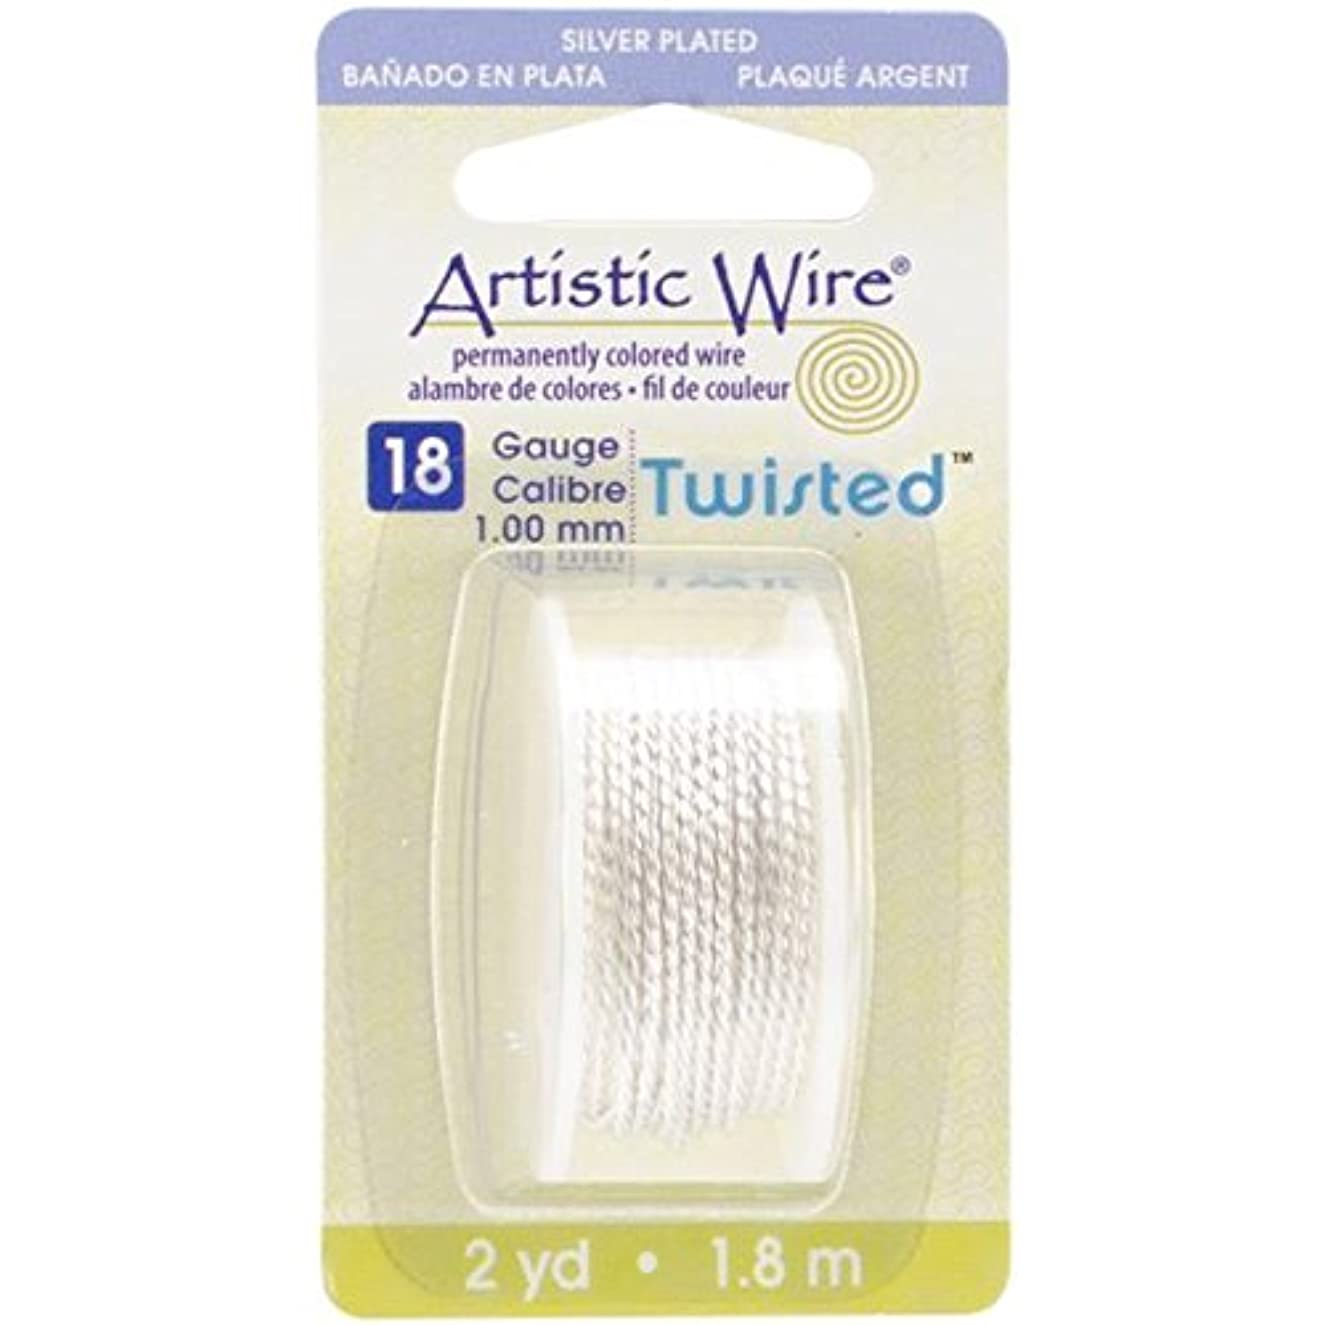 Beadalon AWD18TS1 18 Gauge Twisted Round-Non-Tarnish Artistic Wire, 2-Yard, Silver